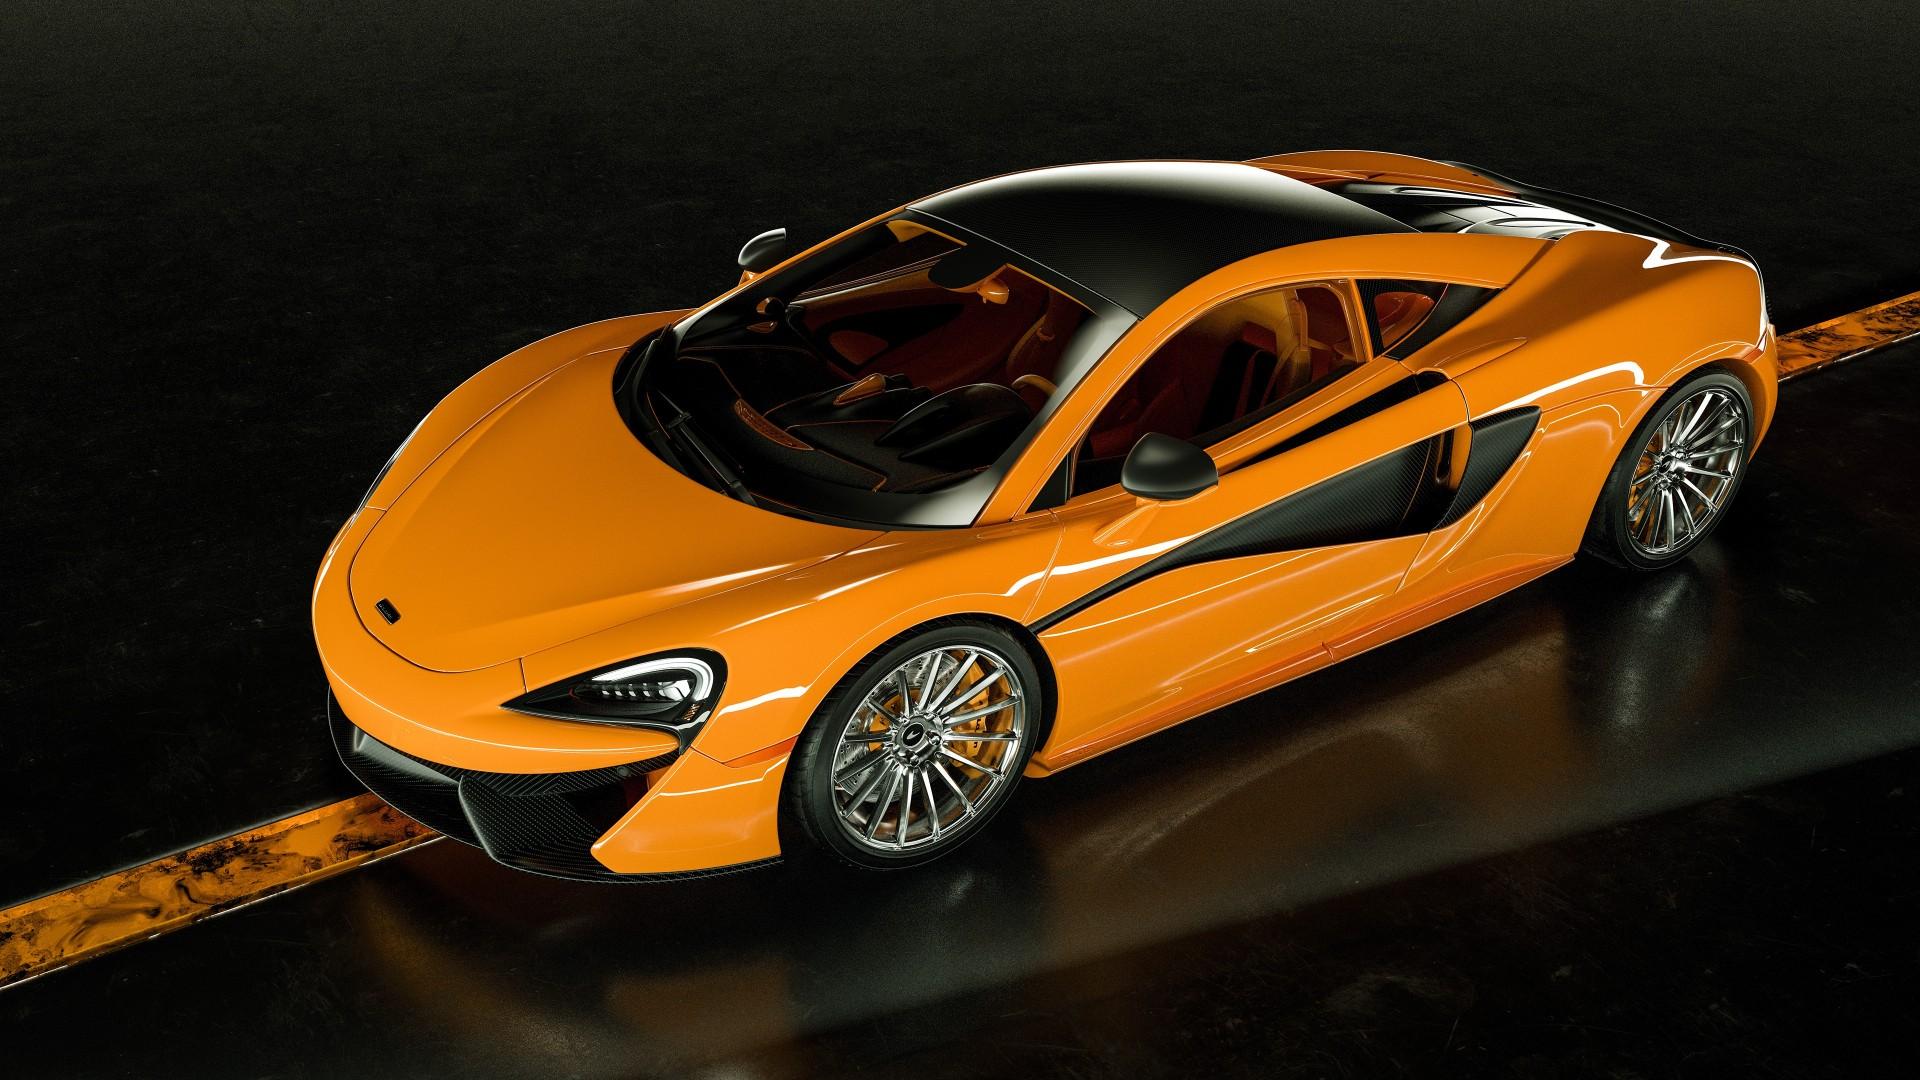 wallpaper mclaren 570s 2019 cars supercar luxury cars